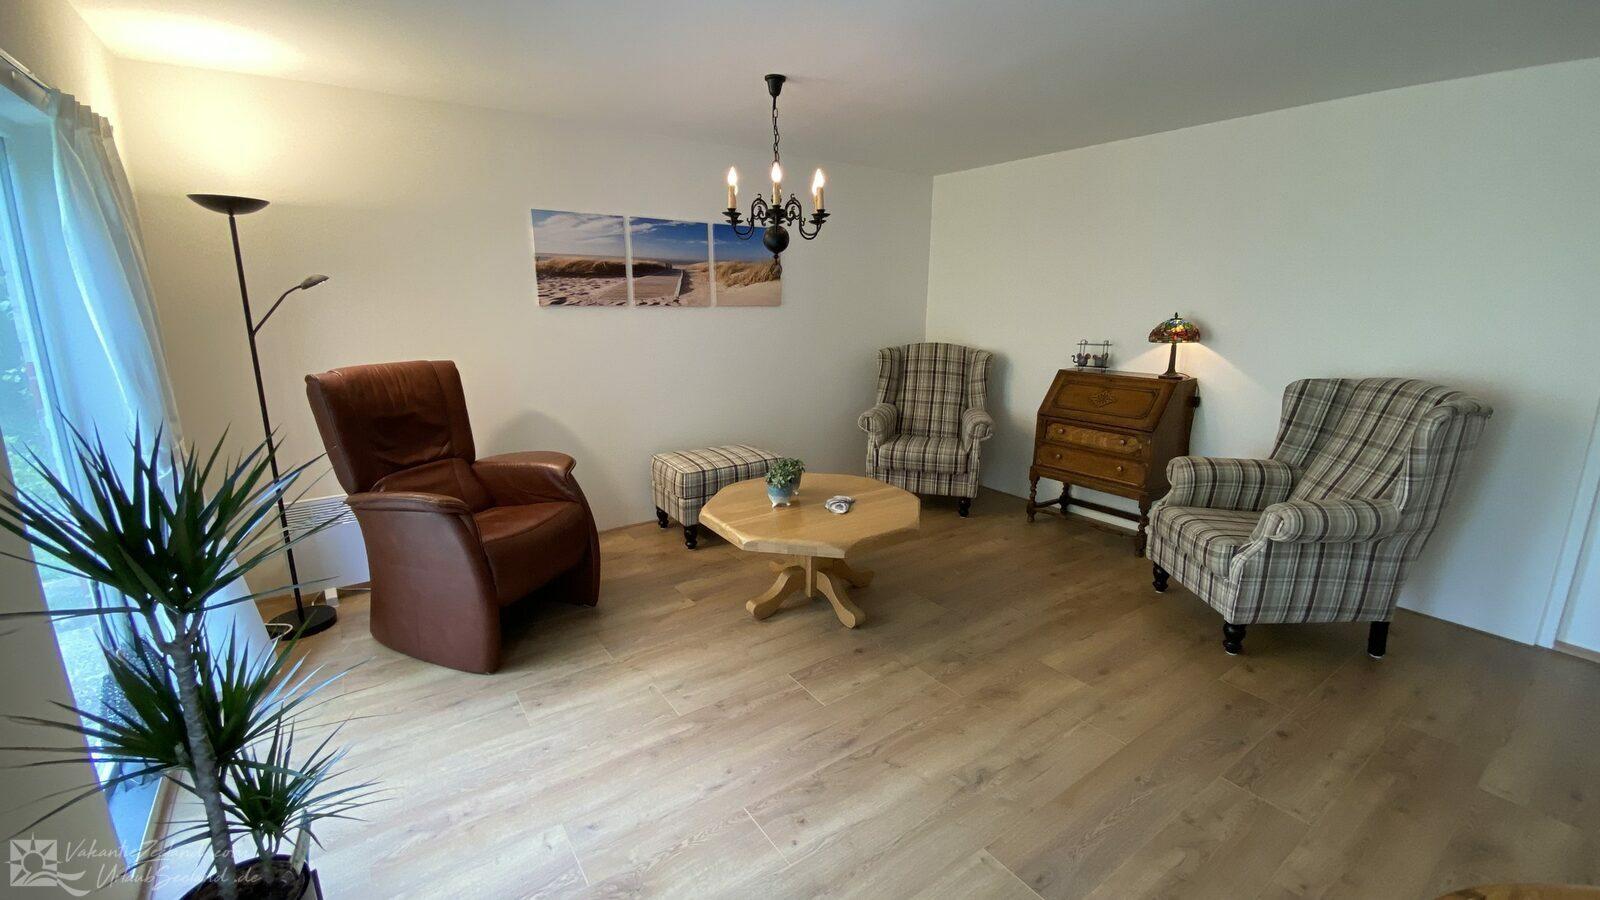 VZ997 Apartment in Aardenburg